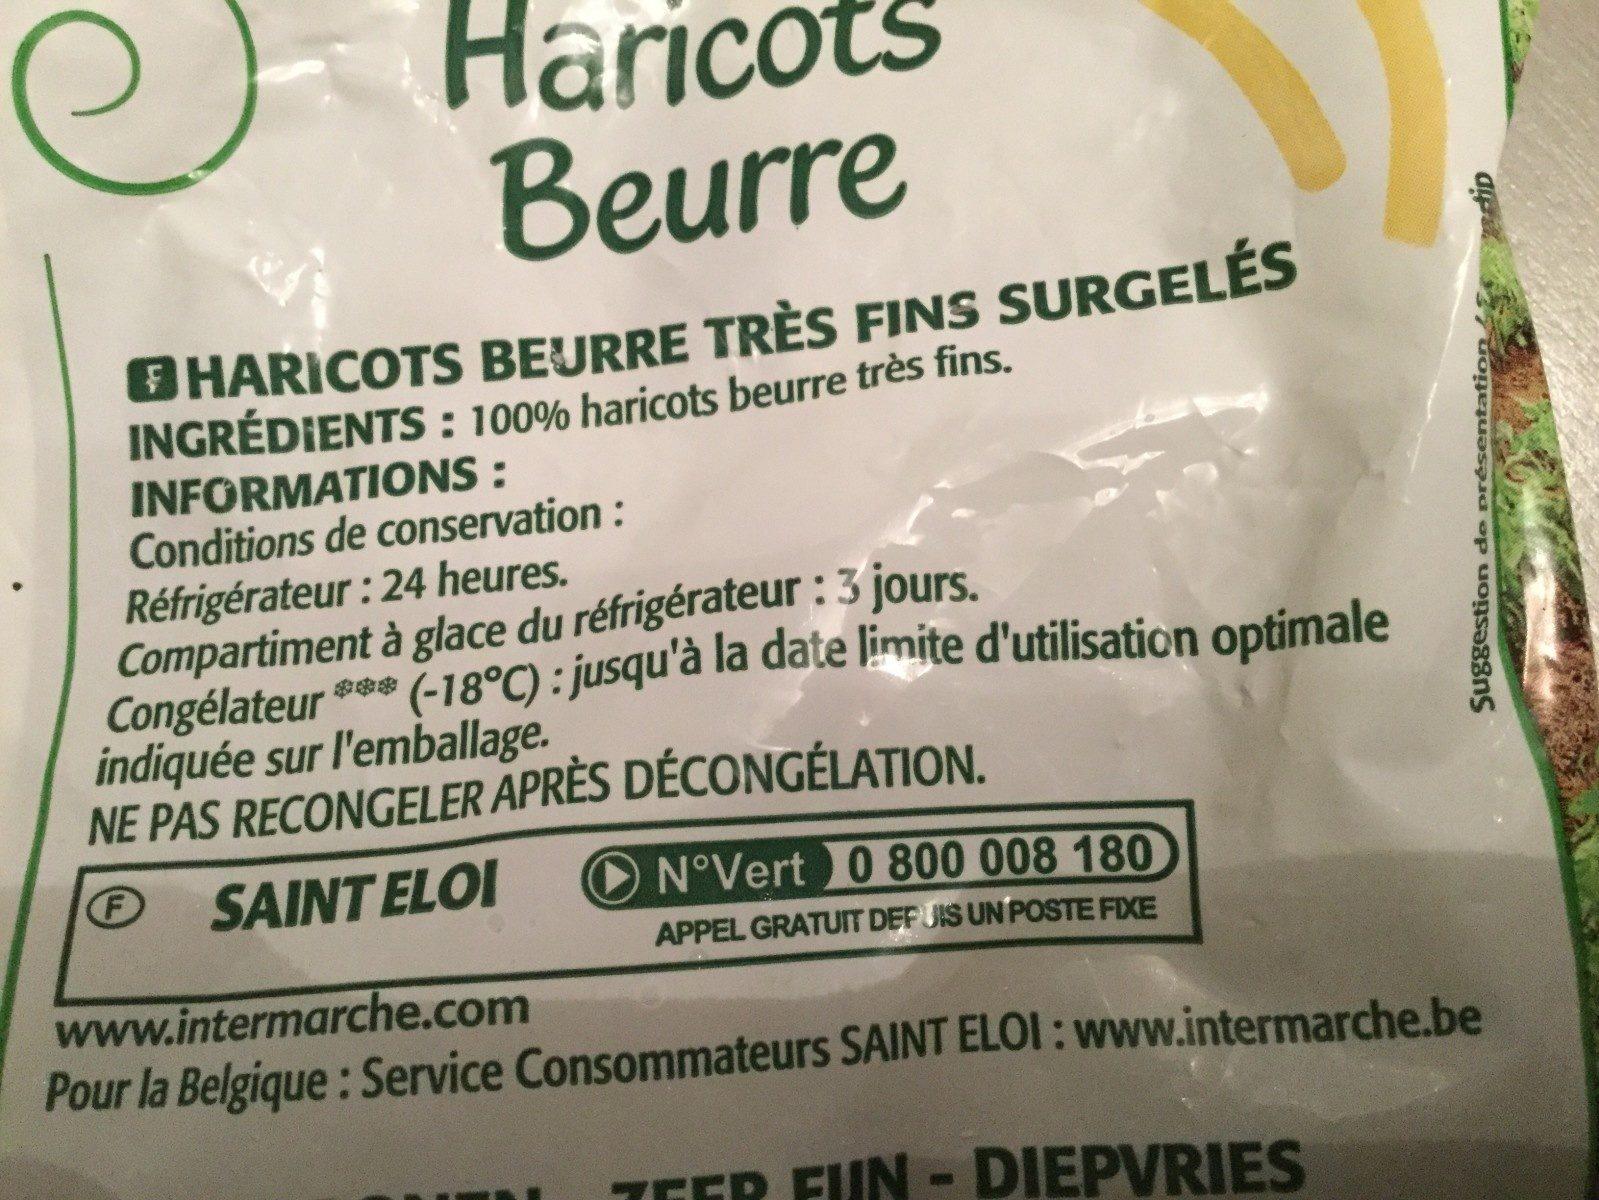 Haricots beurre très fins - Ingredienti - fr